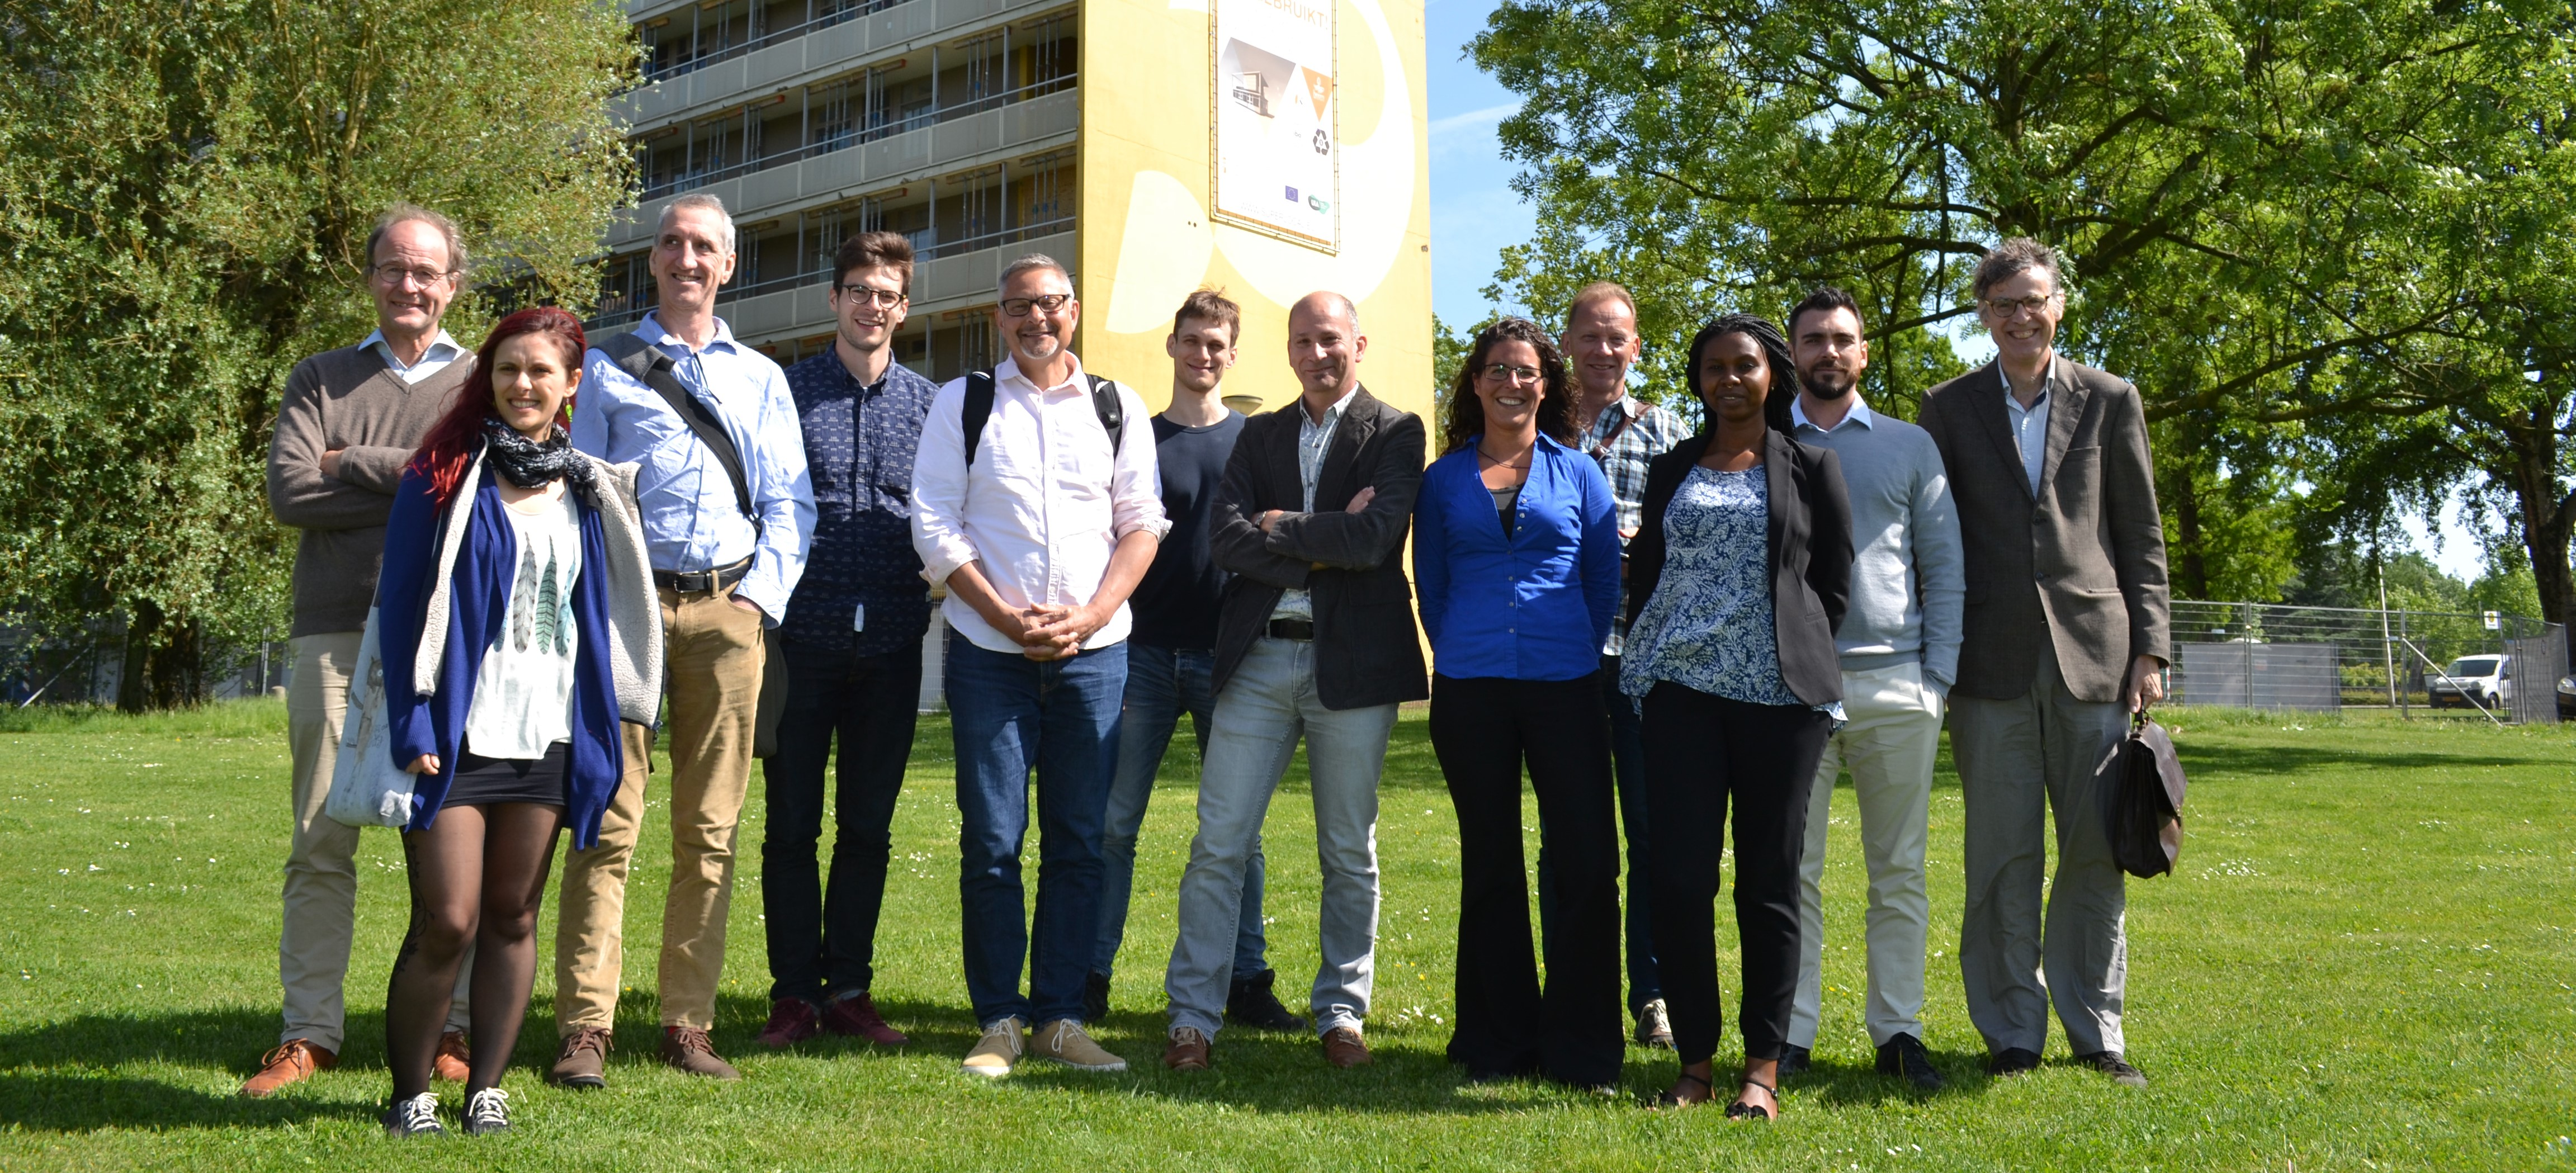 Kick-off-Meeting in Maastricht